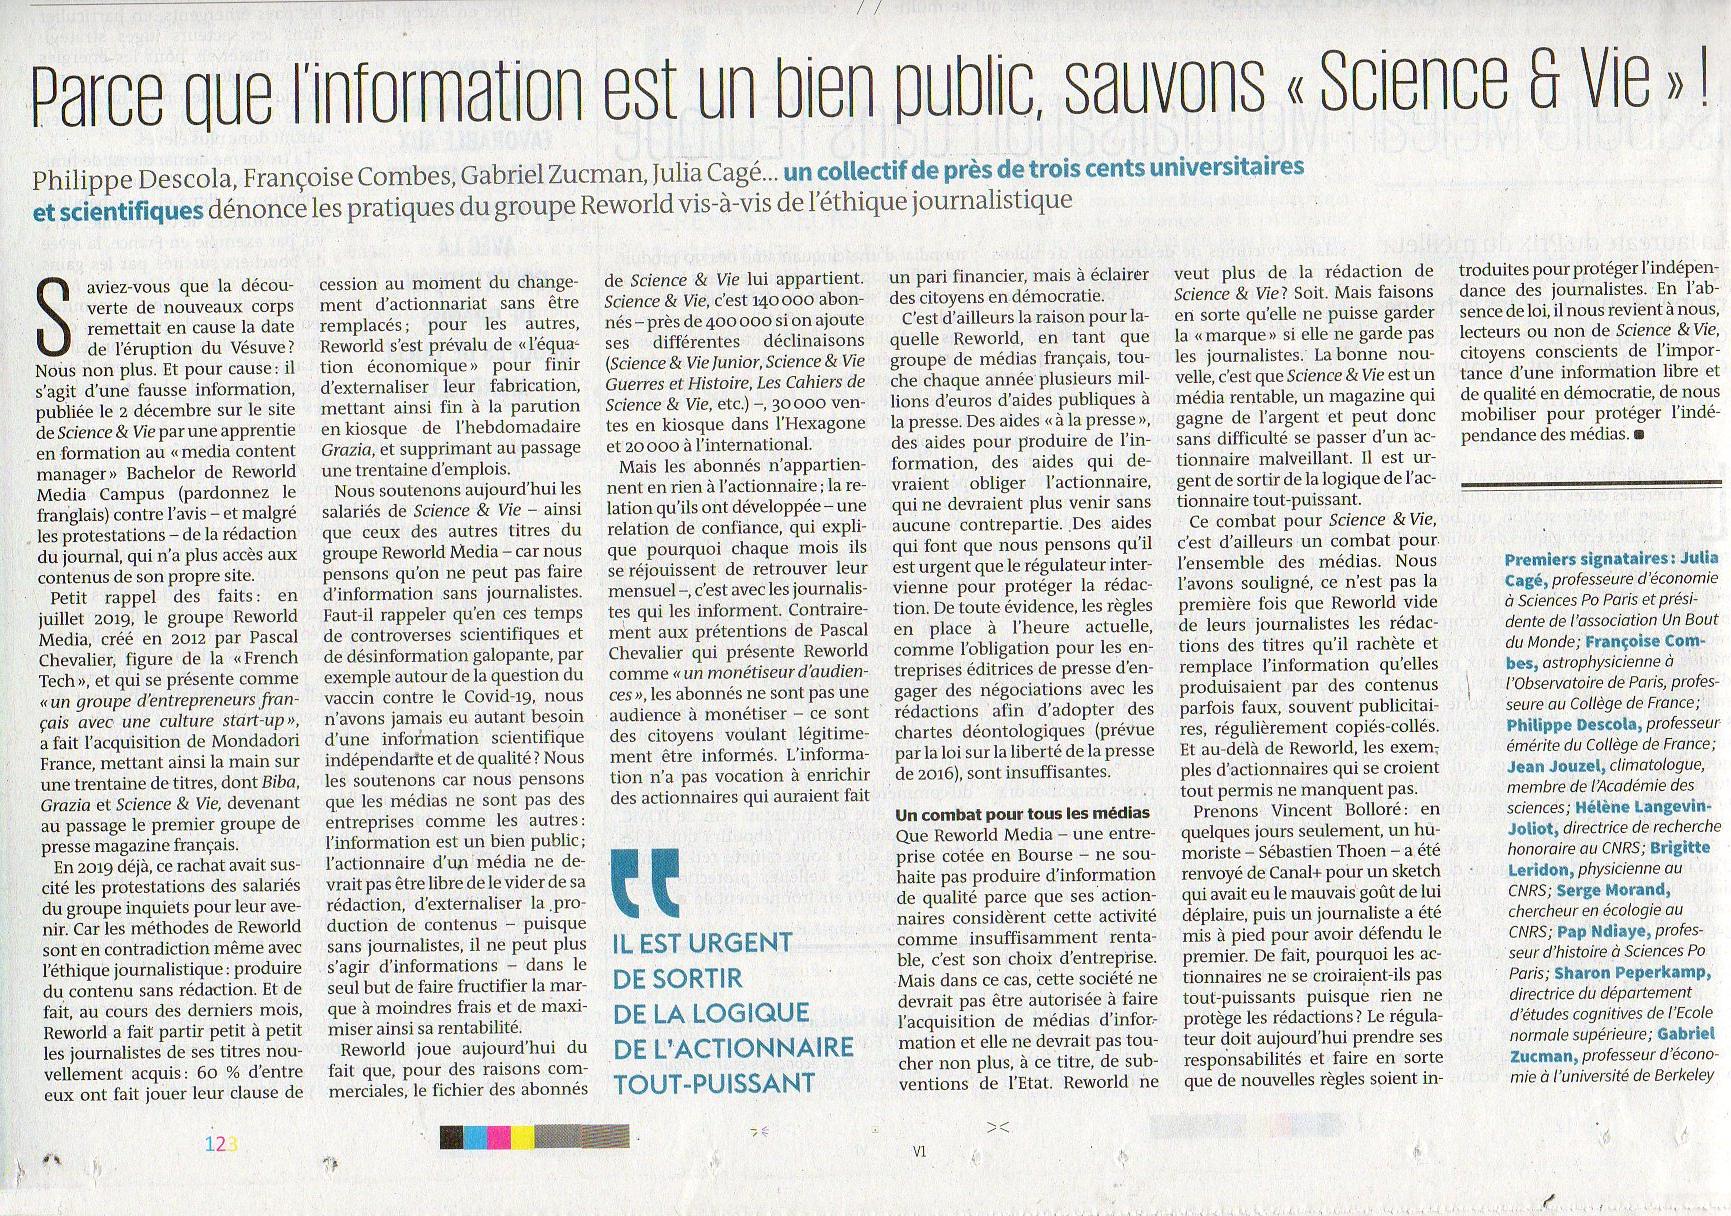 SciencesVie001.jpg